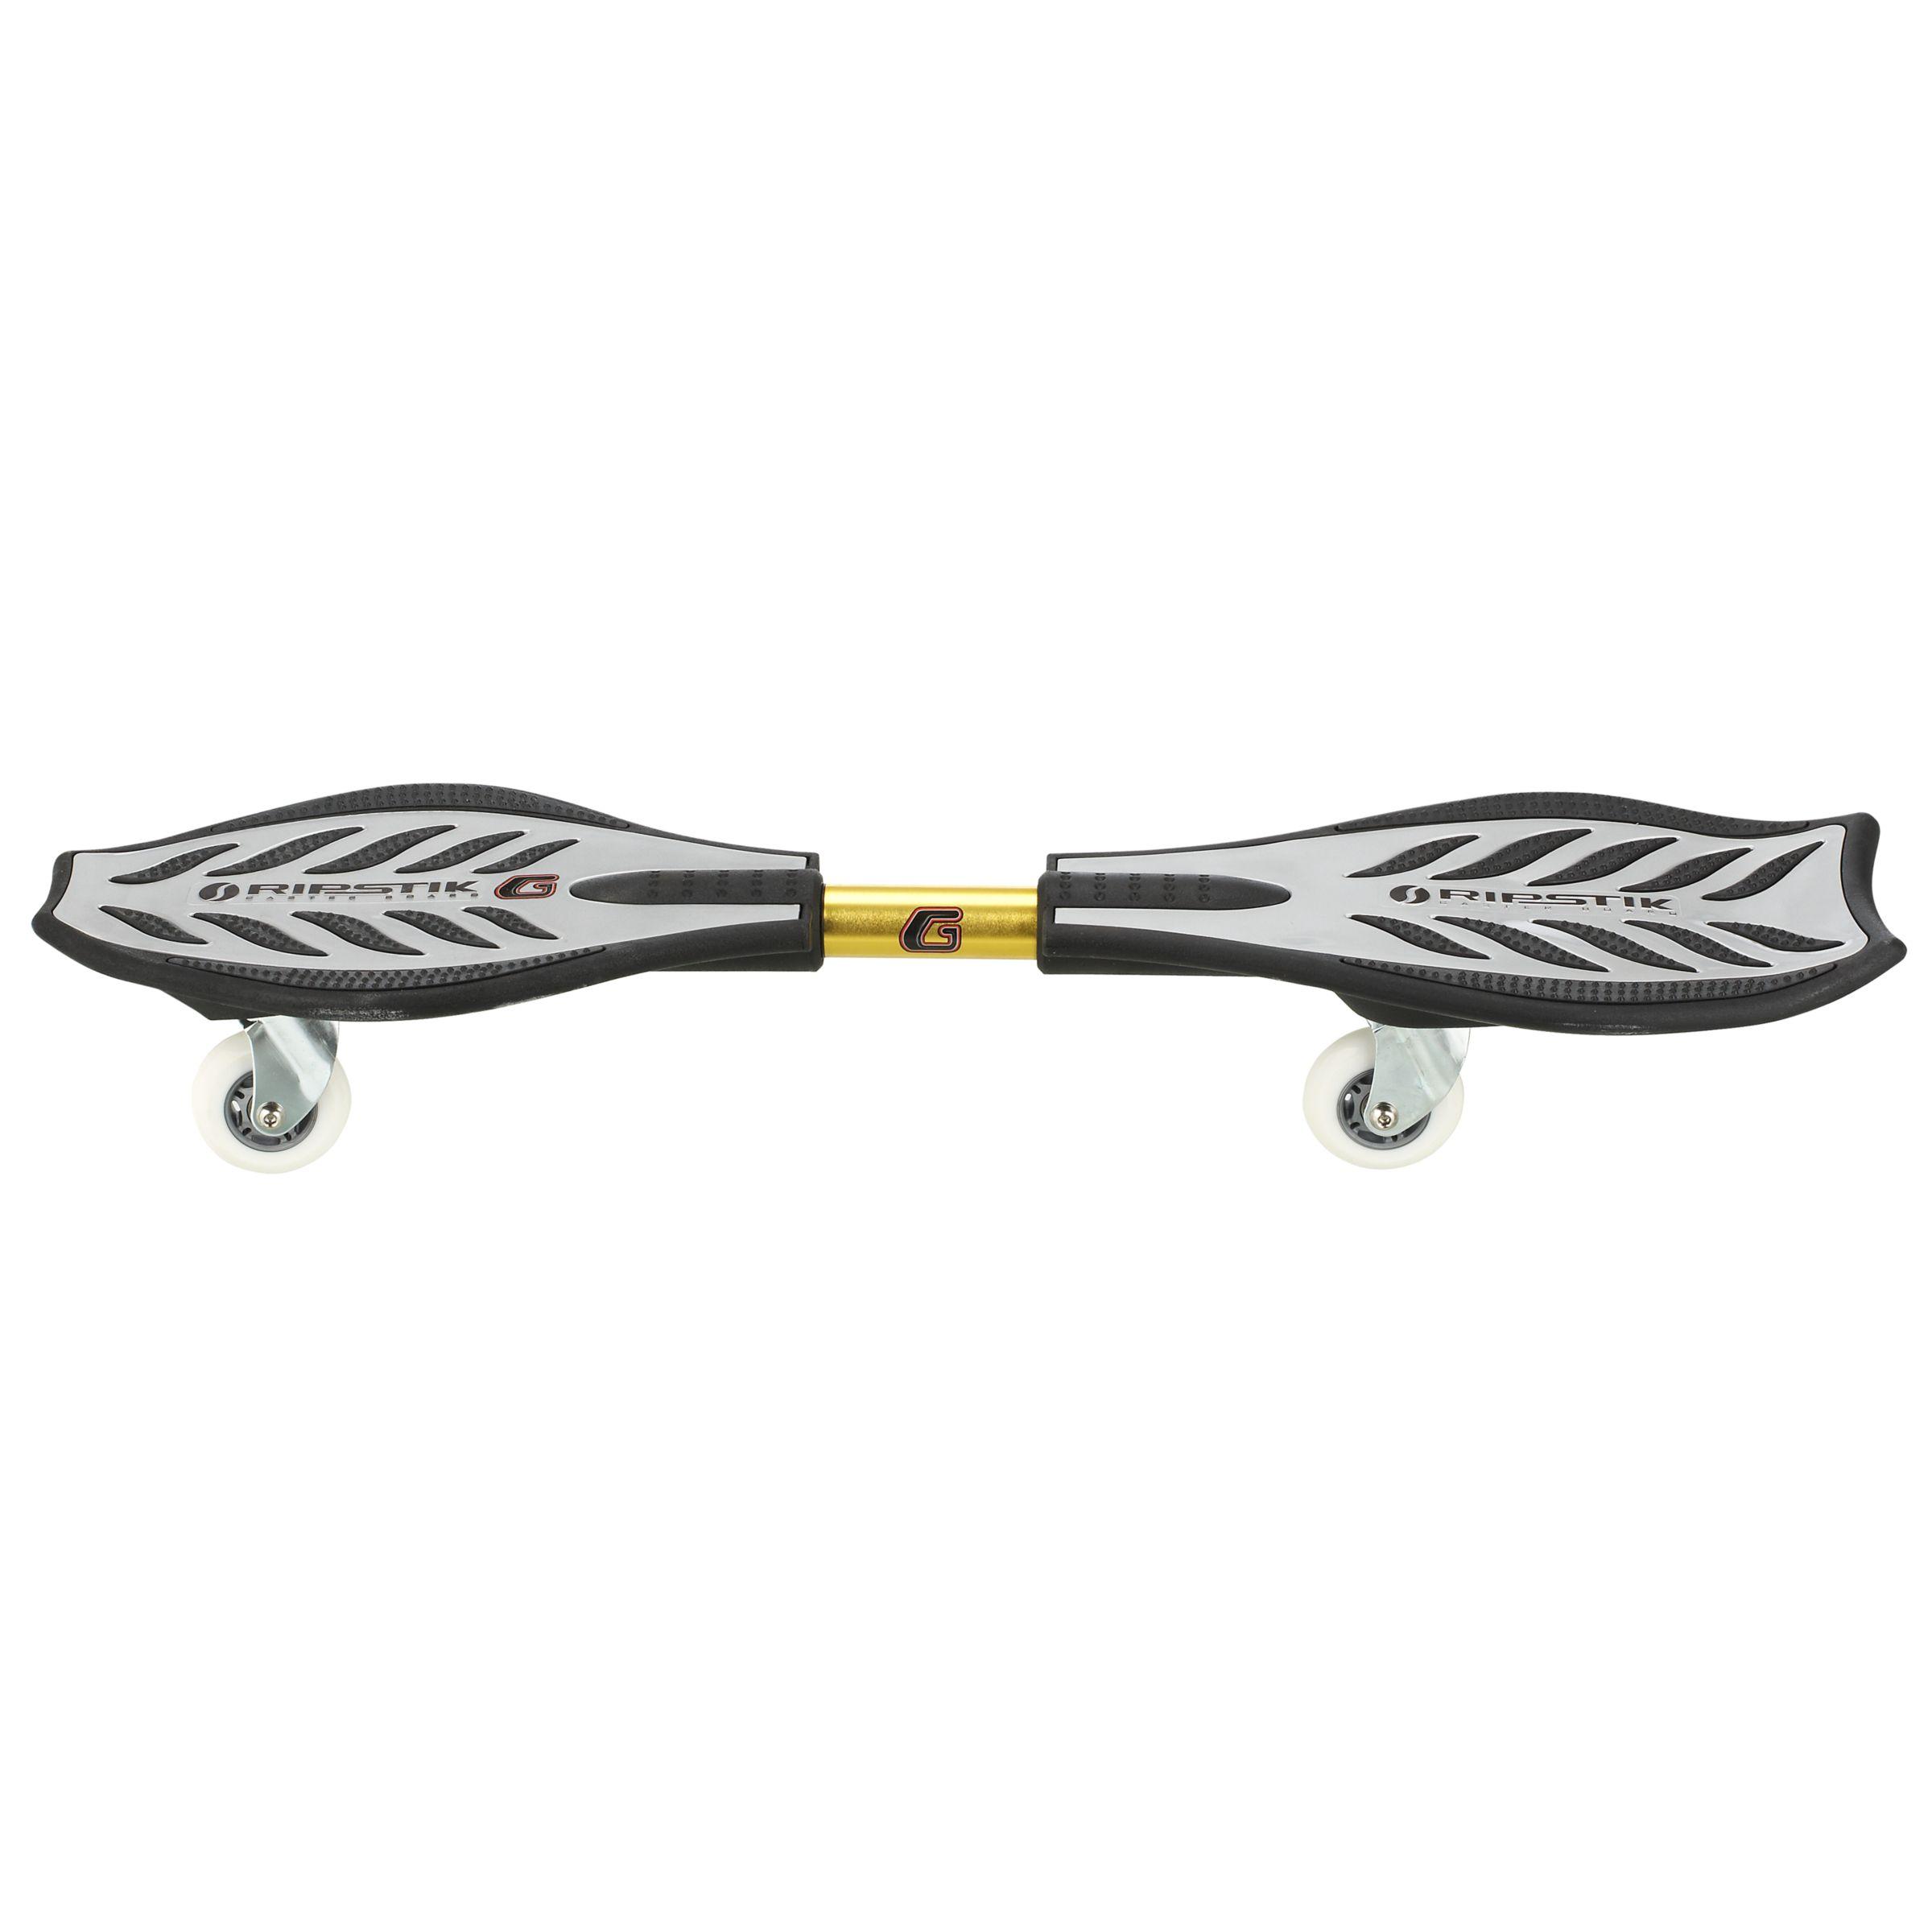 RipStick G Skateboard